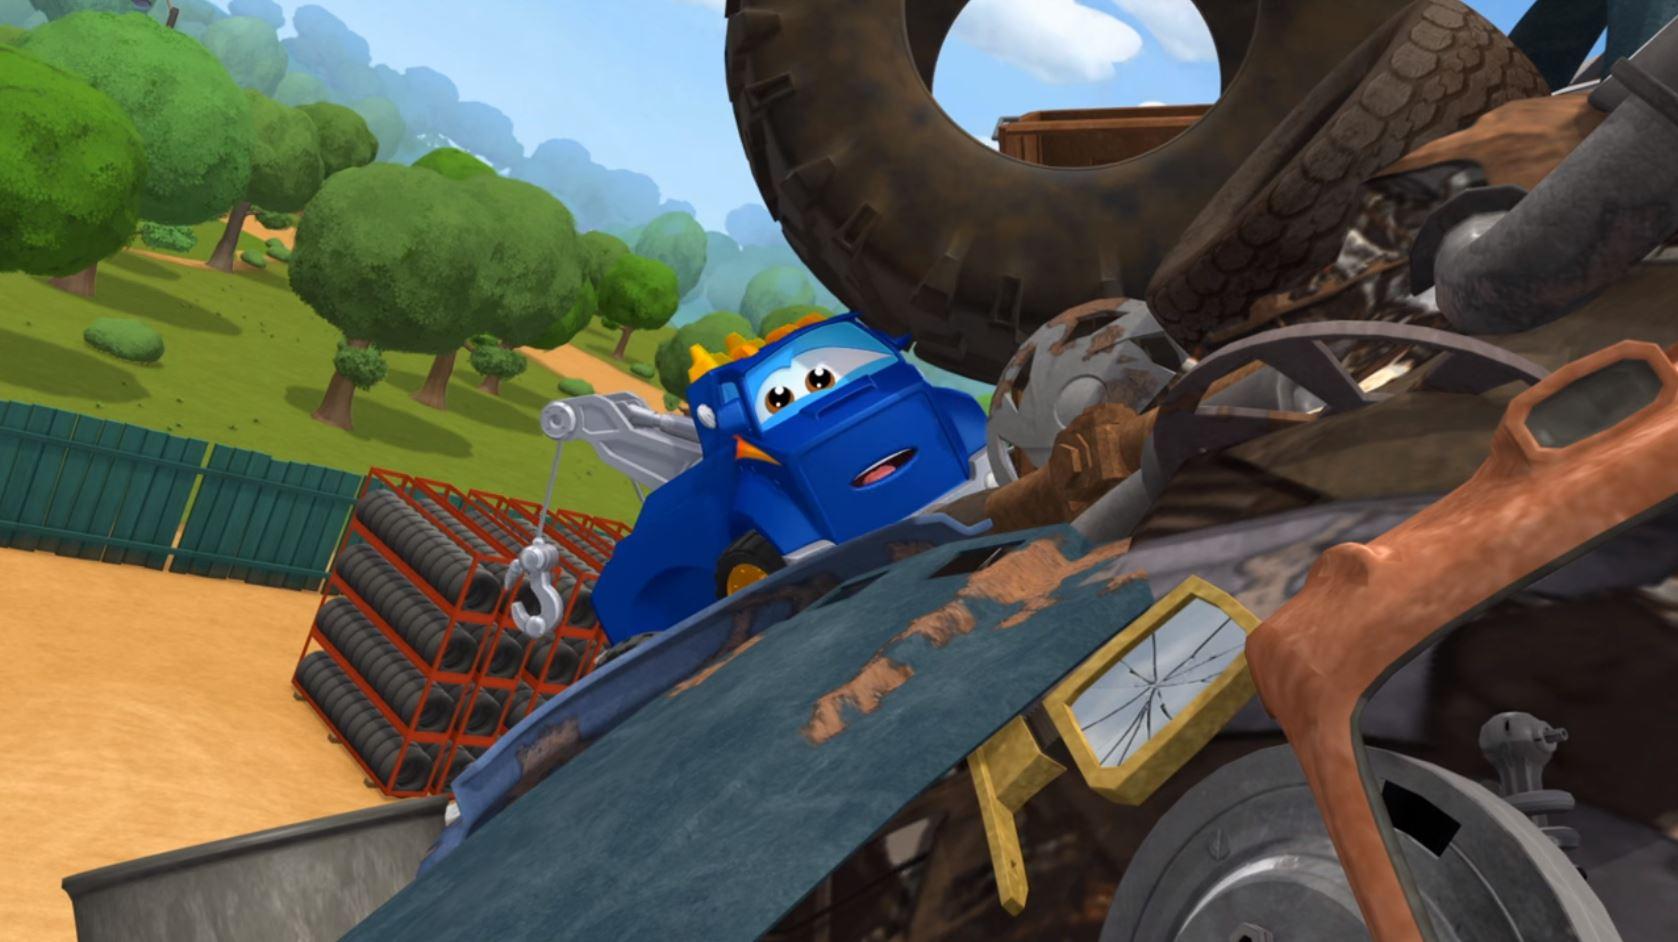 Adventures Of Chuck Friends Netflix Show For Children Kids Cars Racing Automobiles Netflix Show For Children Kids Cars Racing Automobiles on Car Brake Service